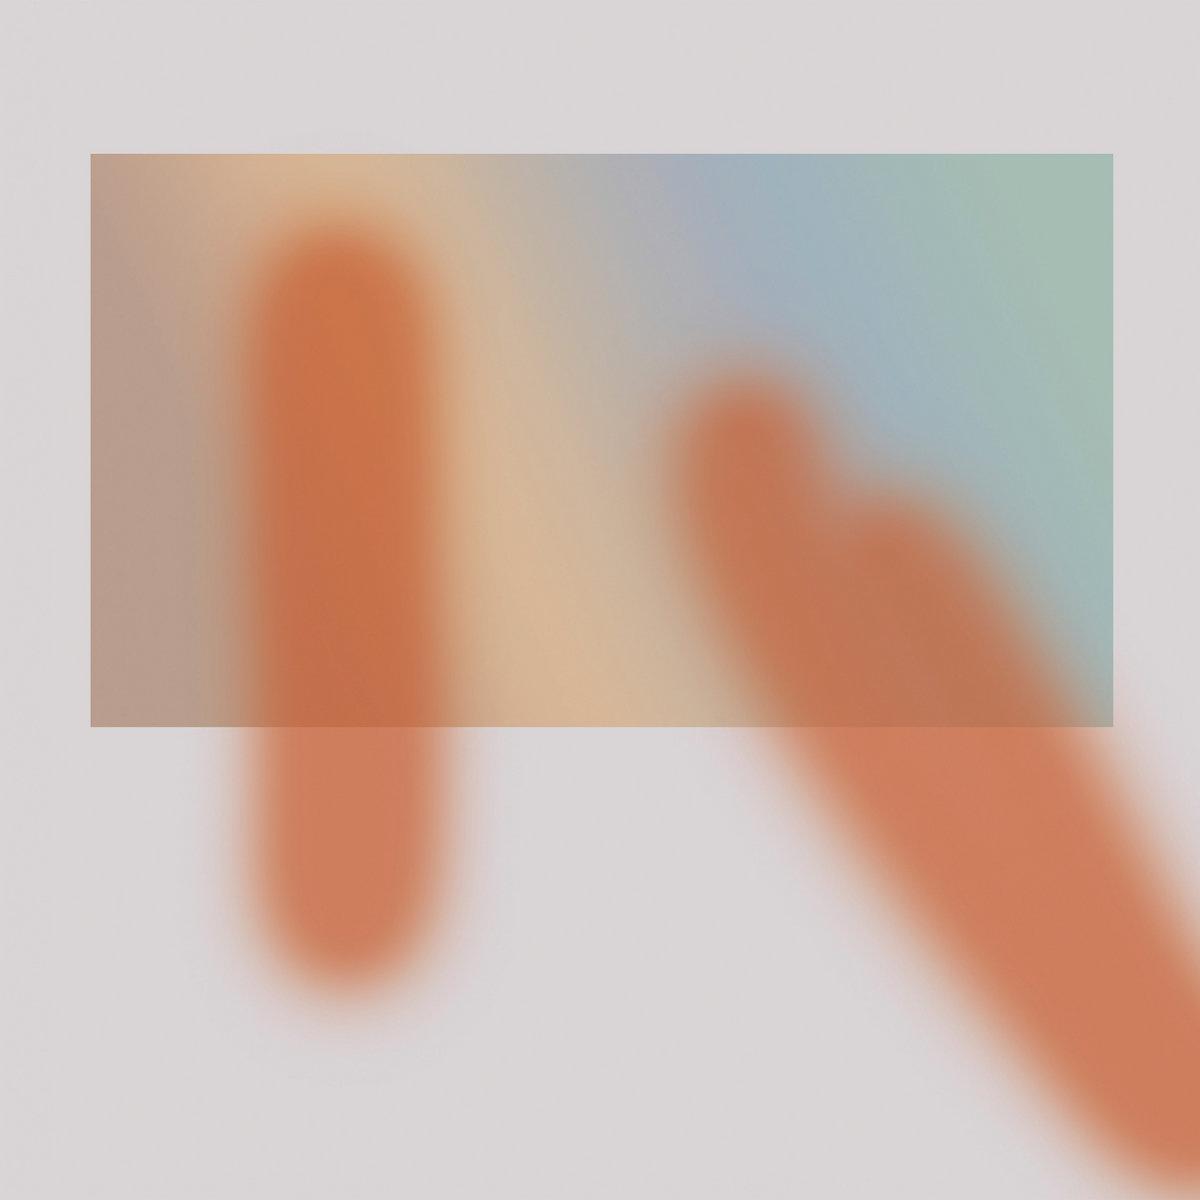 Klavier Album Cover